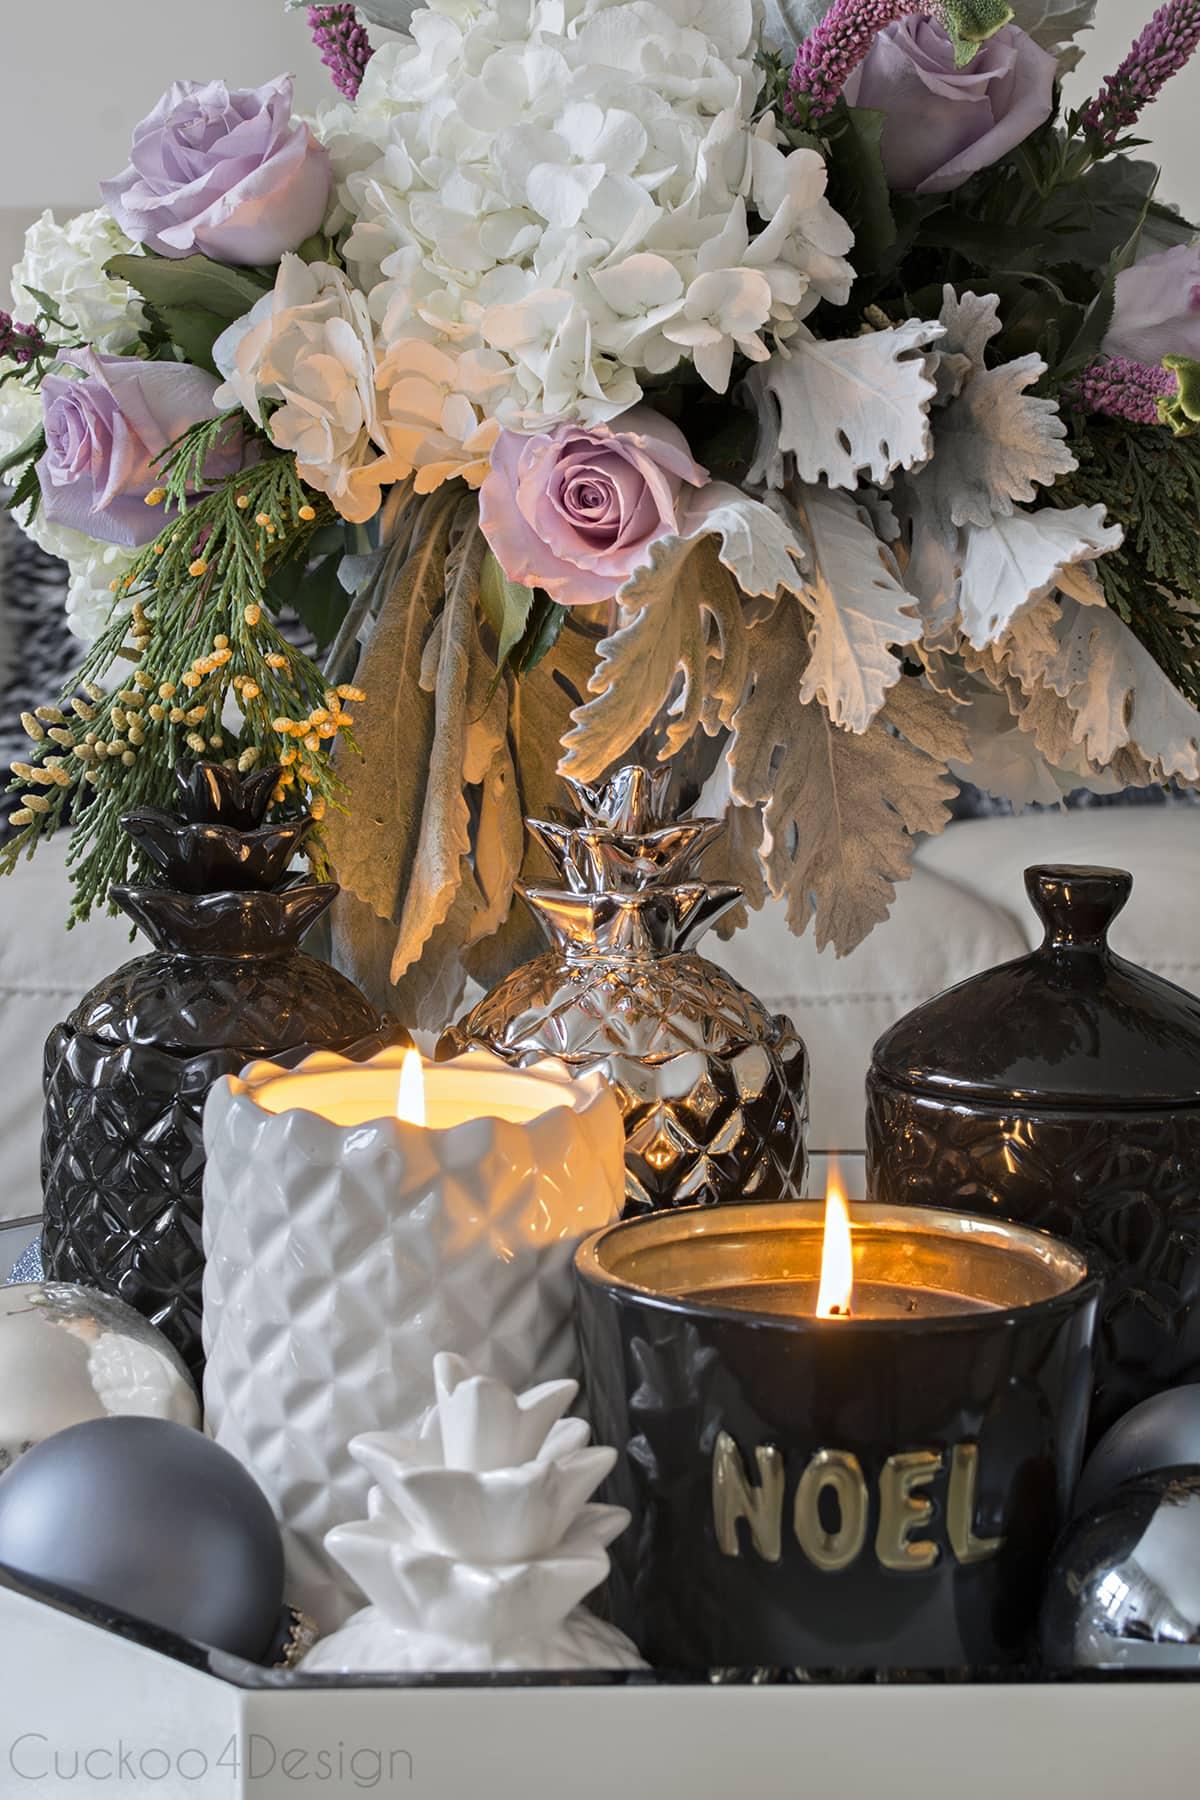 Elegant Thompson Ferrier candles